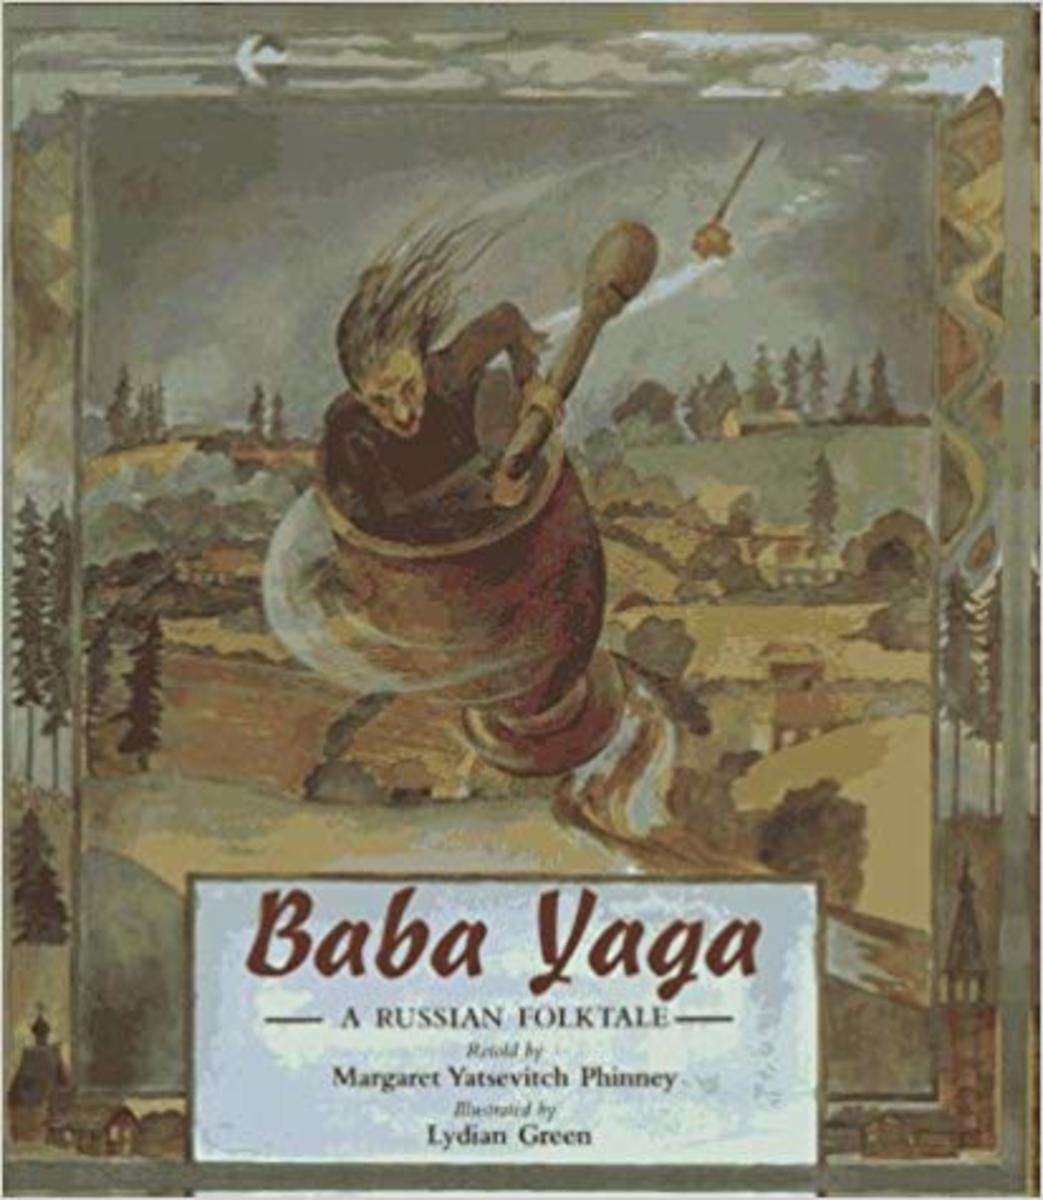 Baba Yaga (A Russian Folktale) by Margaret Yatsevitch Phinney